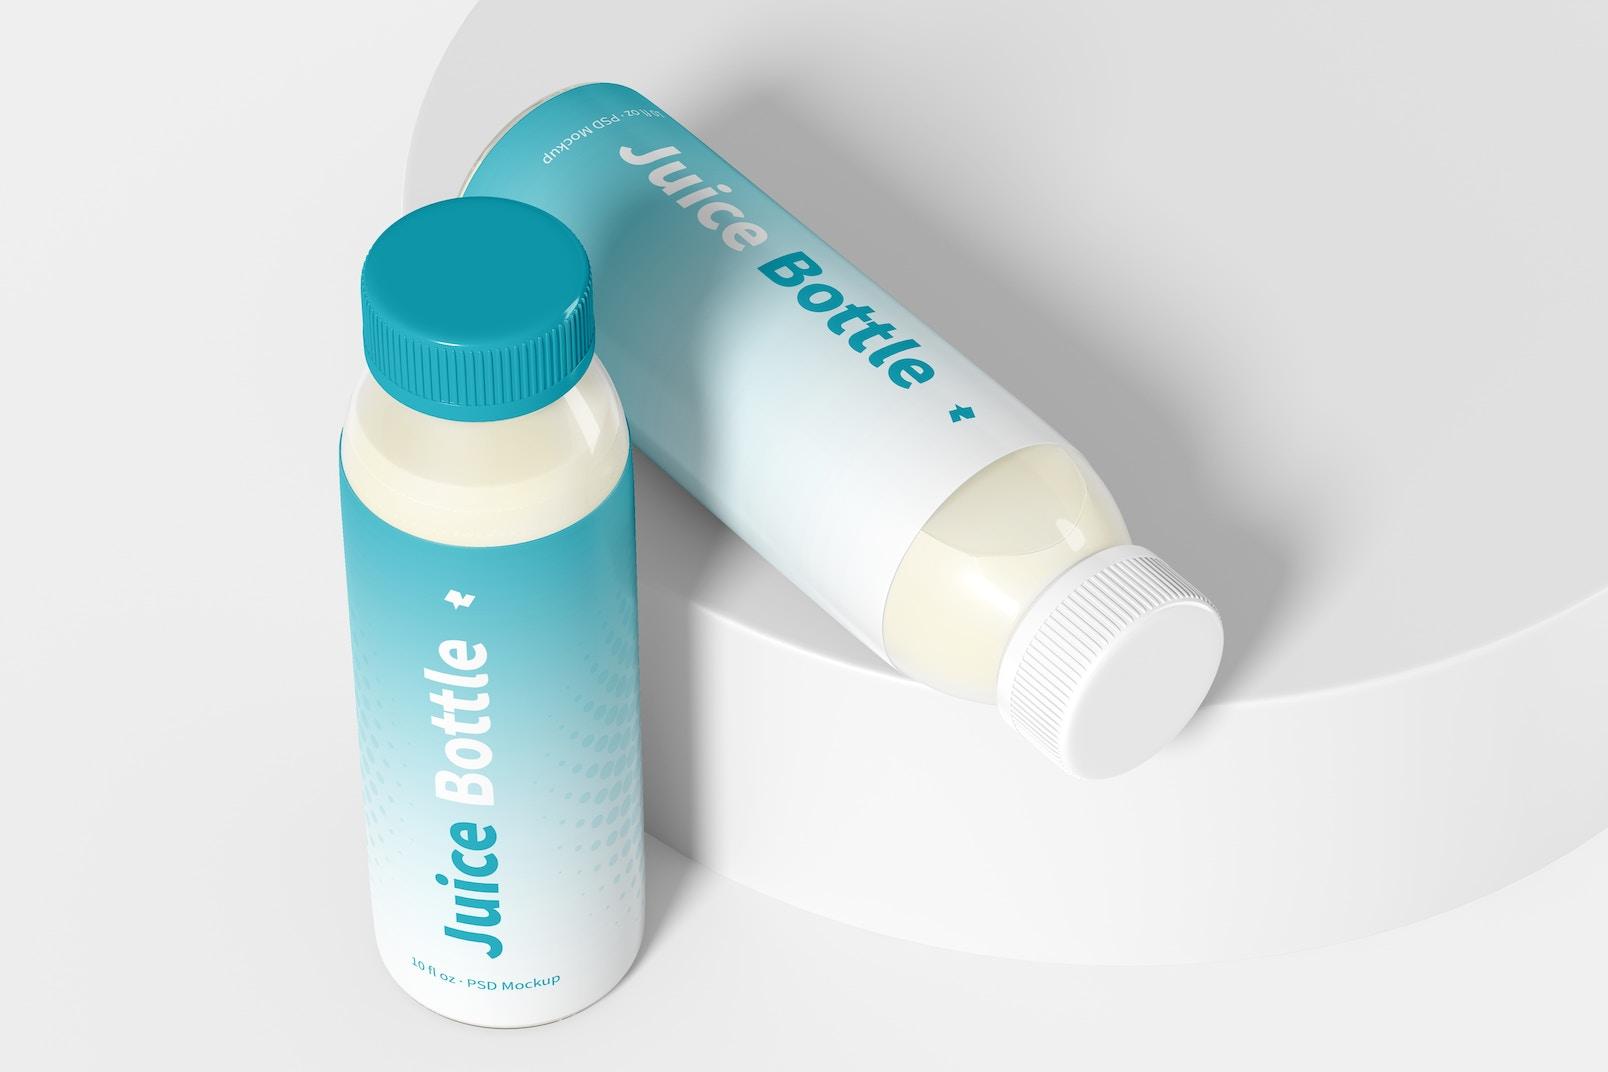 10 oz Clear PET Juice Bottles Mockup, Perspective View